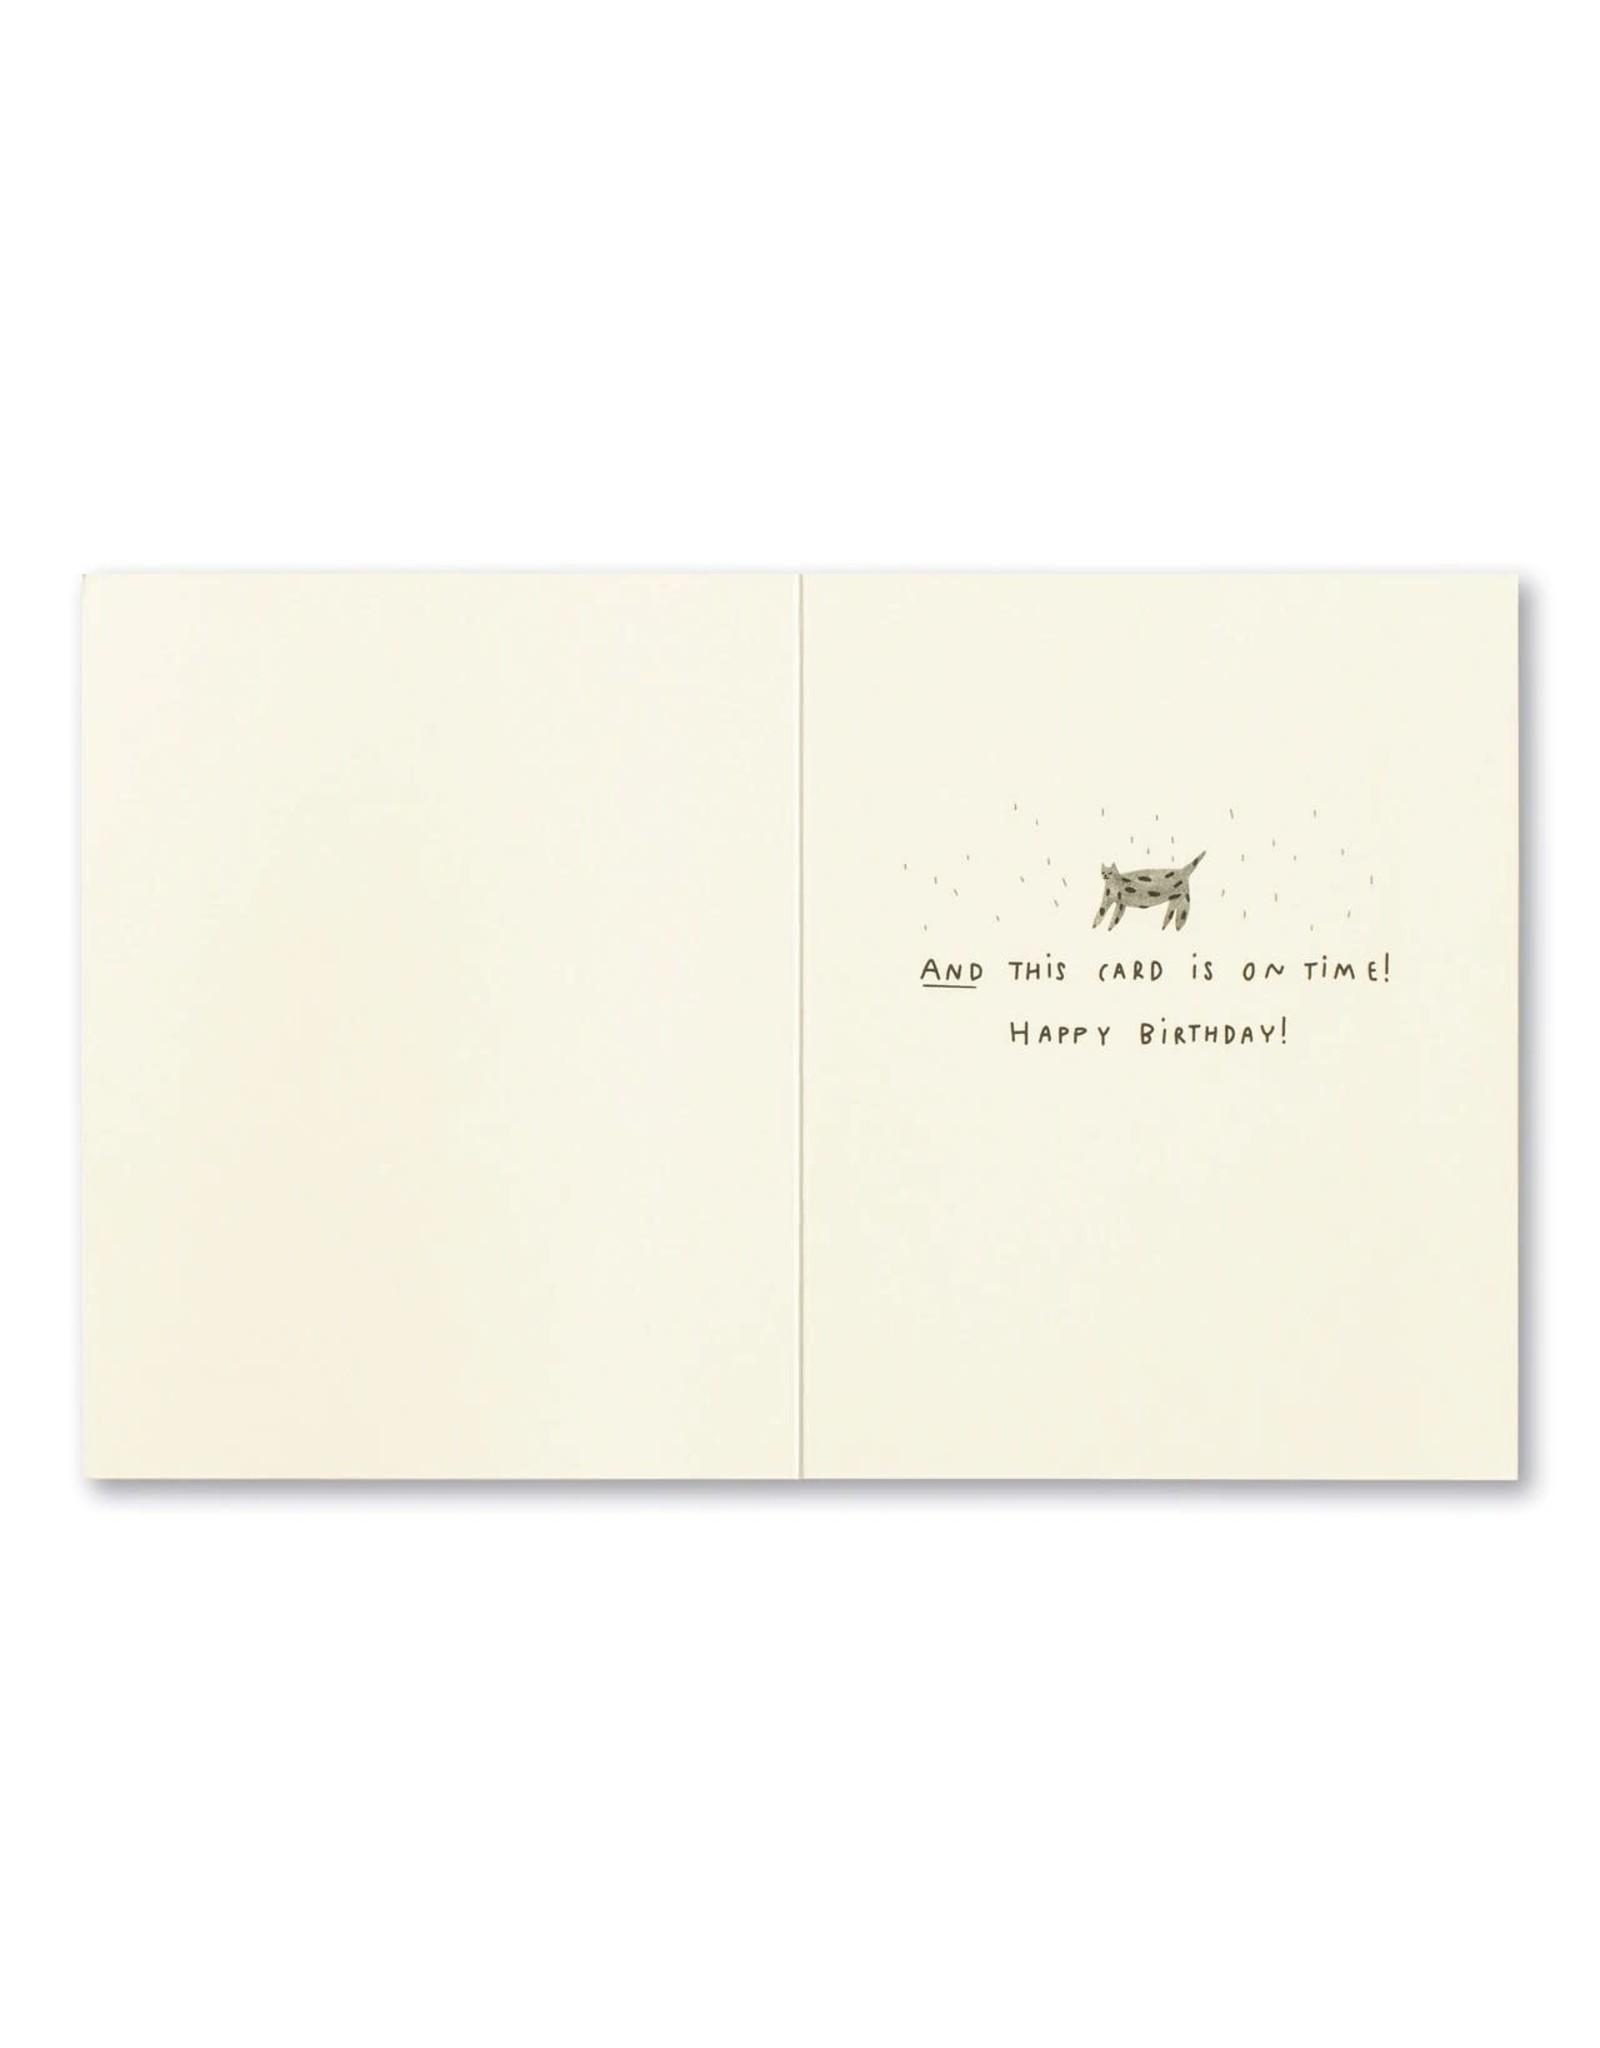 Compendium LM Card Belated Birthday